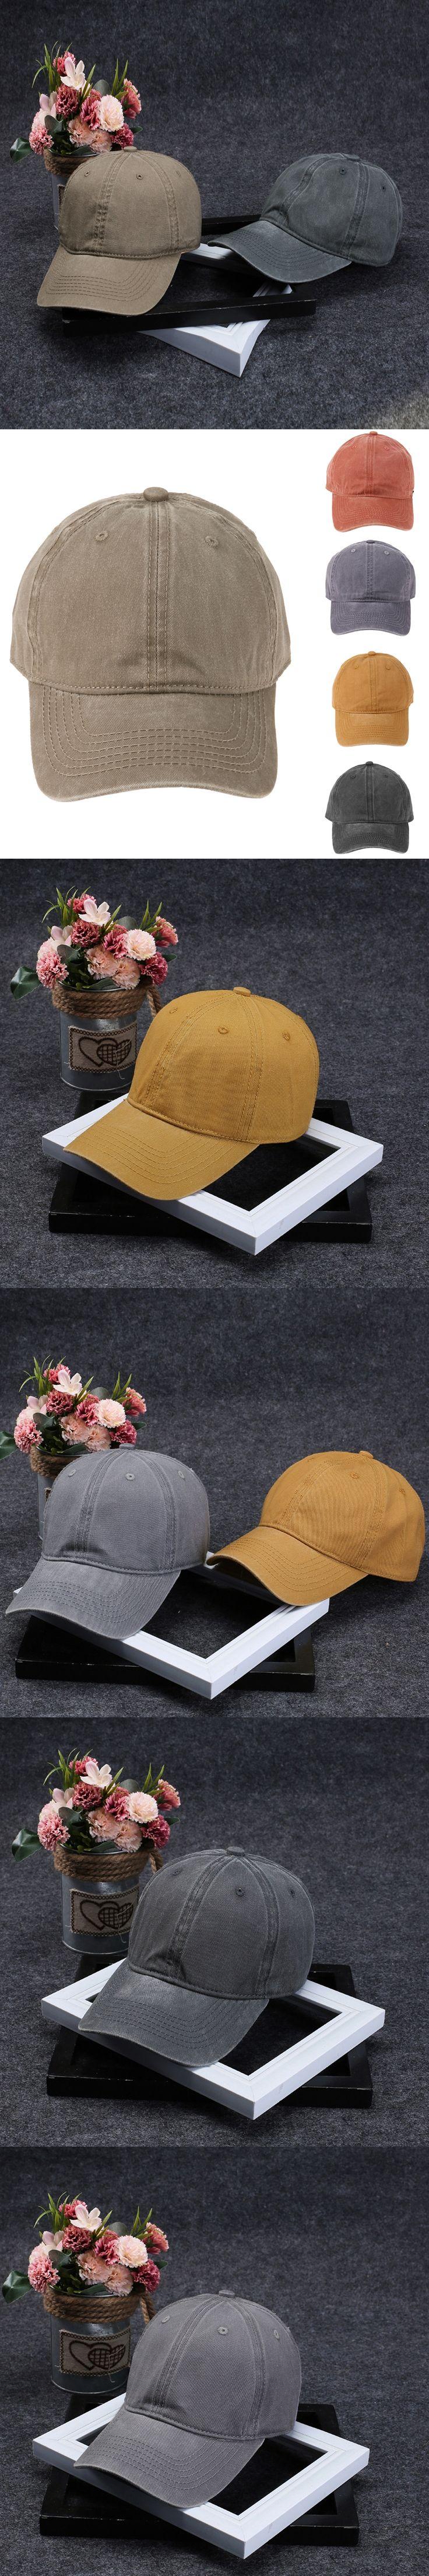 Unisex Adjustable Solid Color Baseball Cap Women Fashion Casual HAT Boys Snapback Hats Casquette Hip Hop 2017 Couple Wash Caps